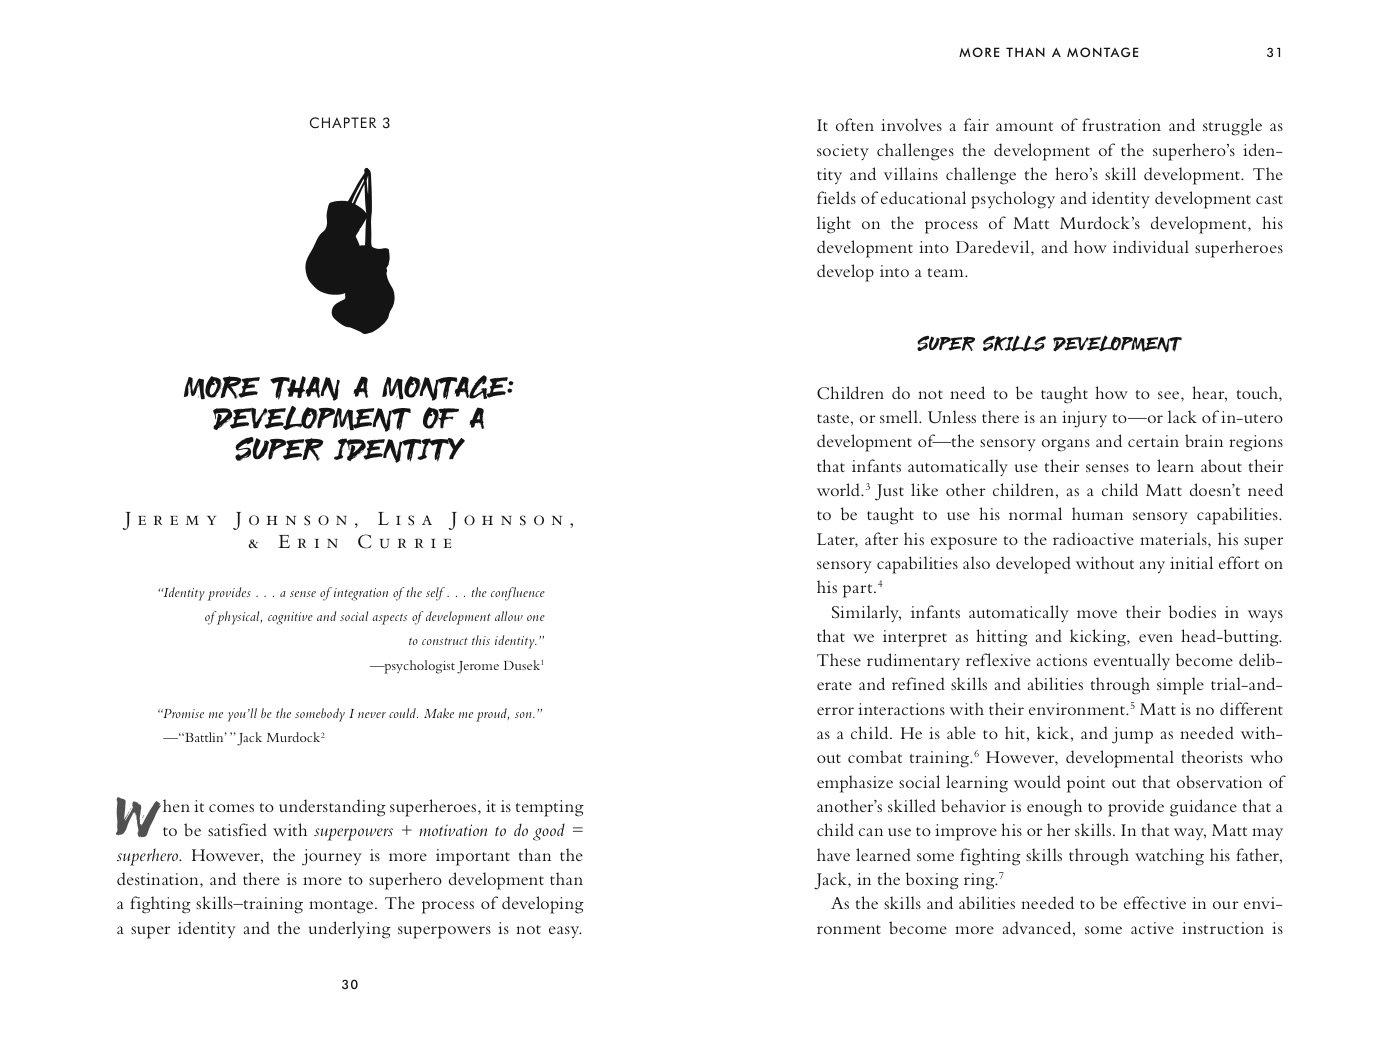 Amazon.com: Daredevil Psychology: The Devil You Know (9781454930112):  Travis Langley, Stan Lee: Books